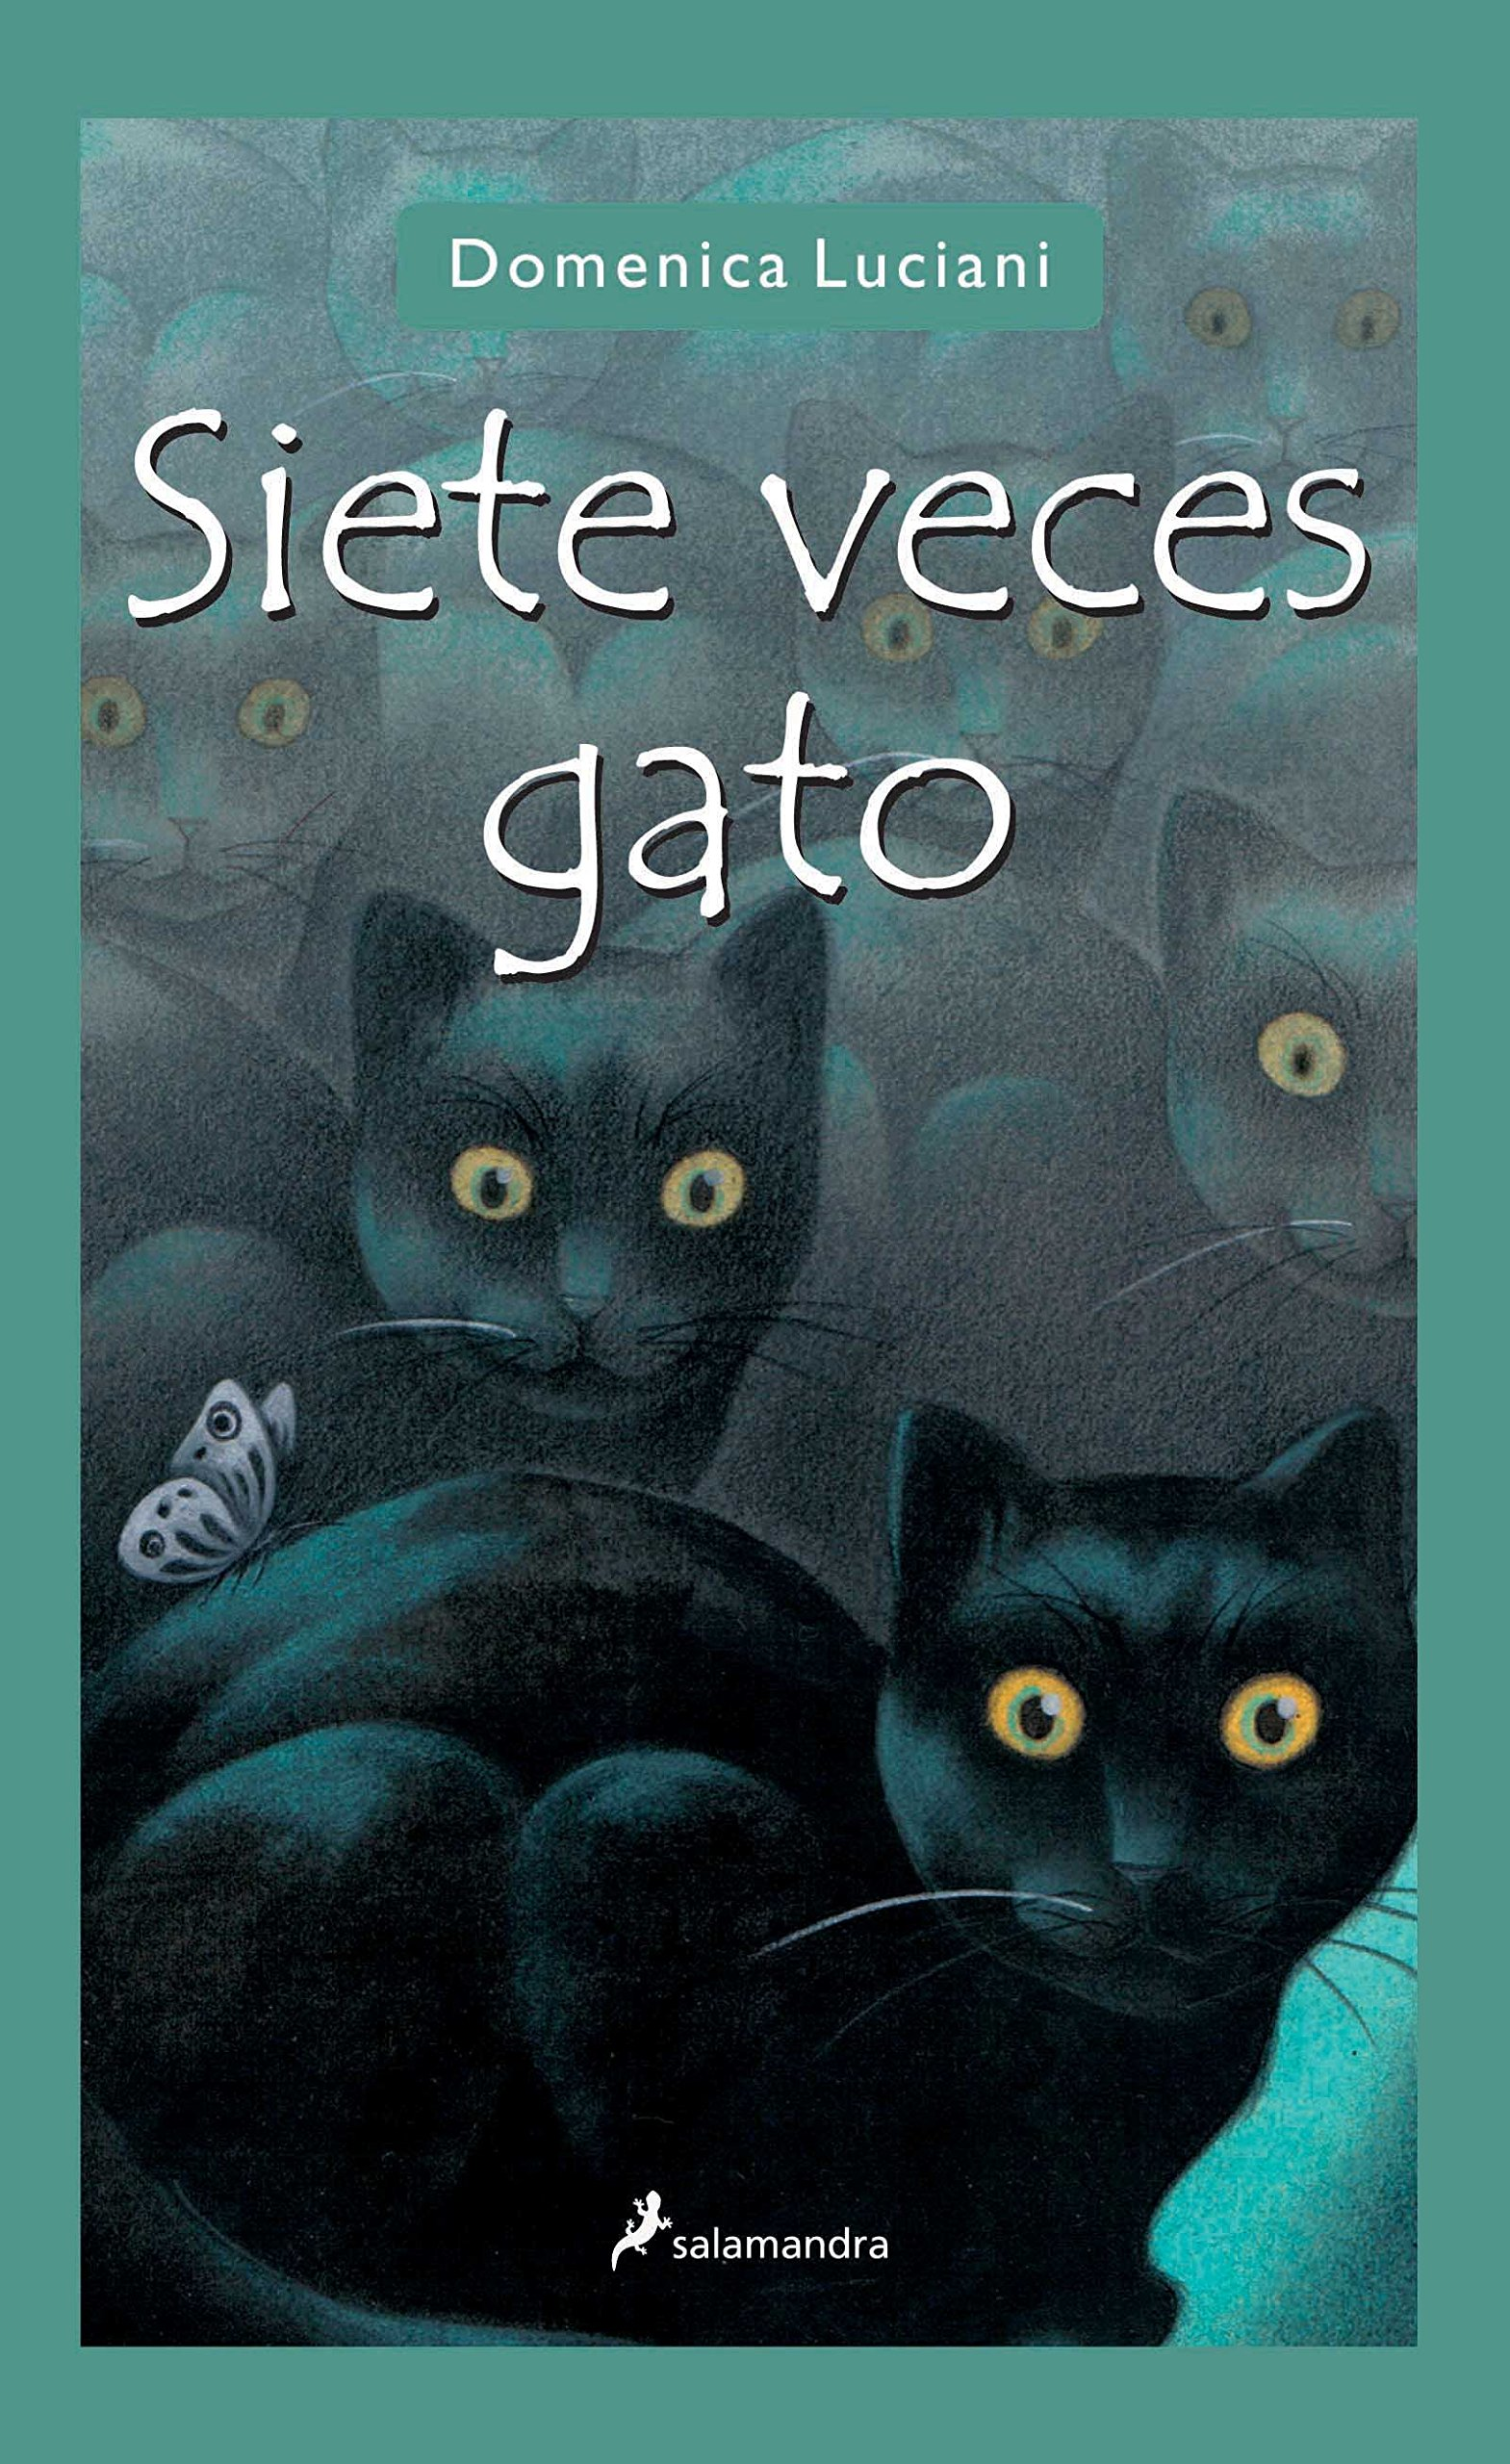 Siete veces gato (Spanish Edition) (Spanish) Hardcover – April 25, 2005